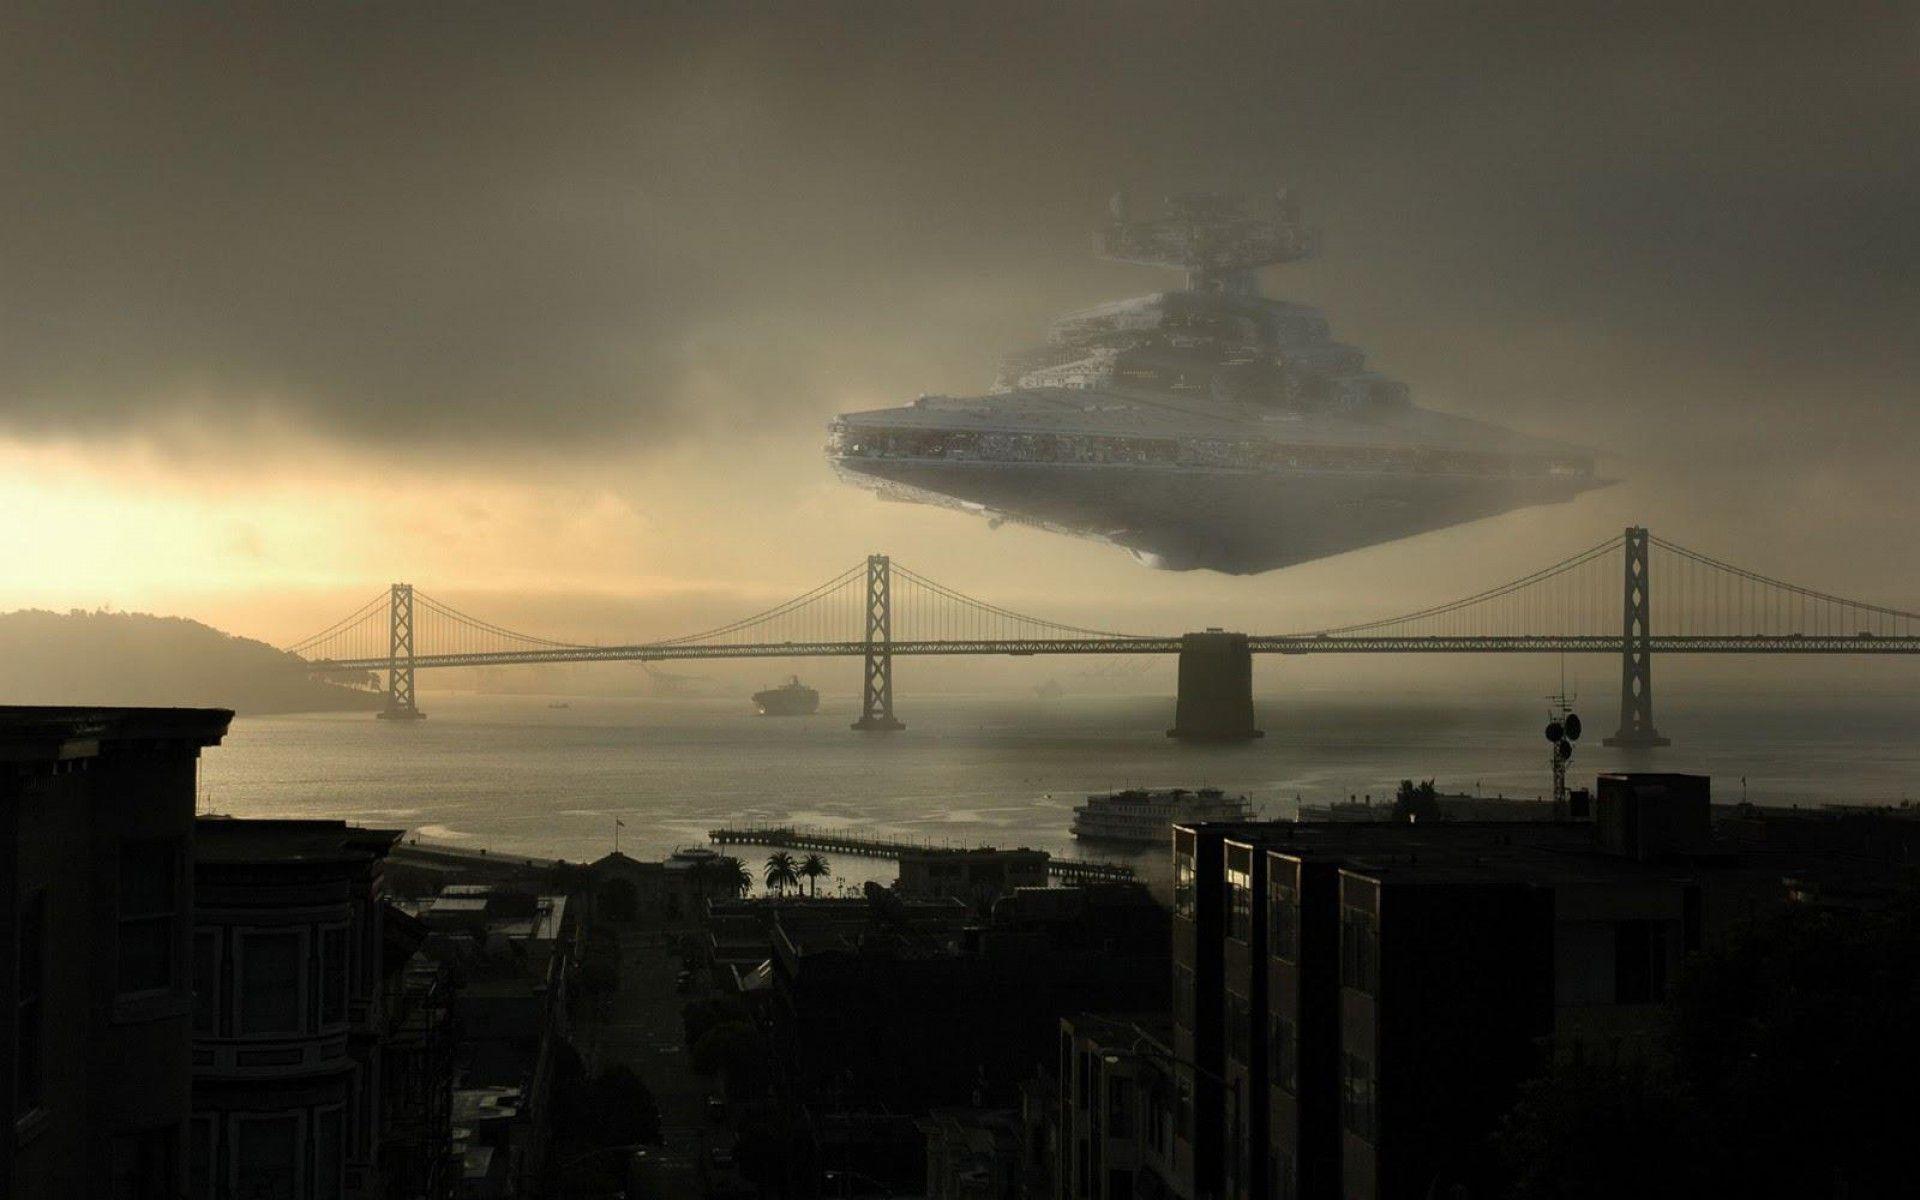 Star Wars Star Destroyer Spaceship Wallpaper - WallpaperTube